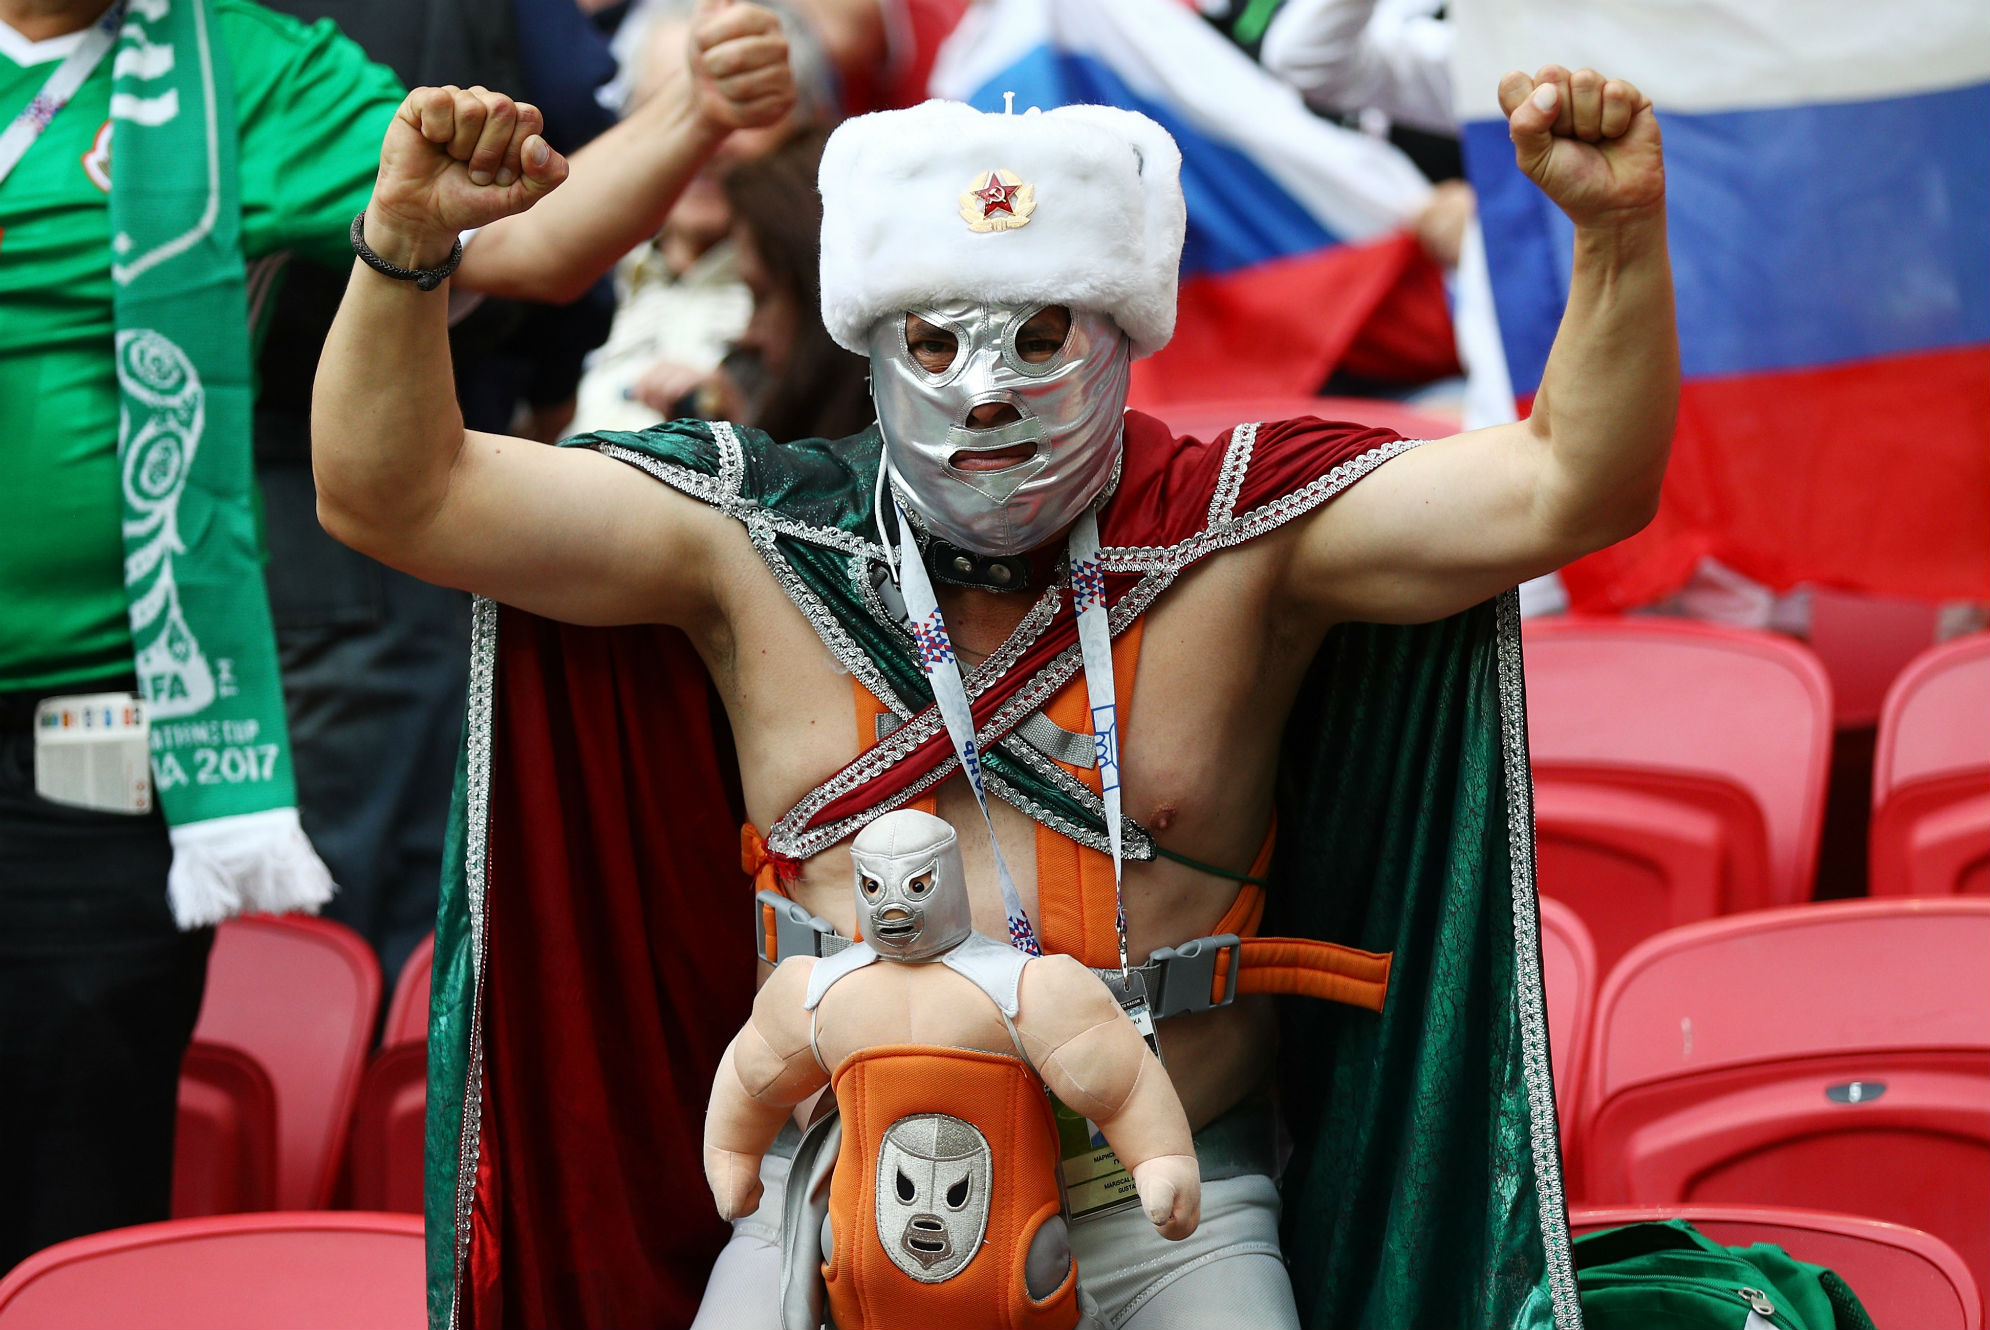 Mexico Russia fans